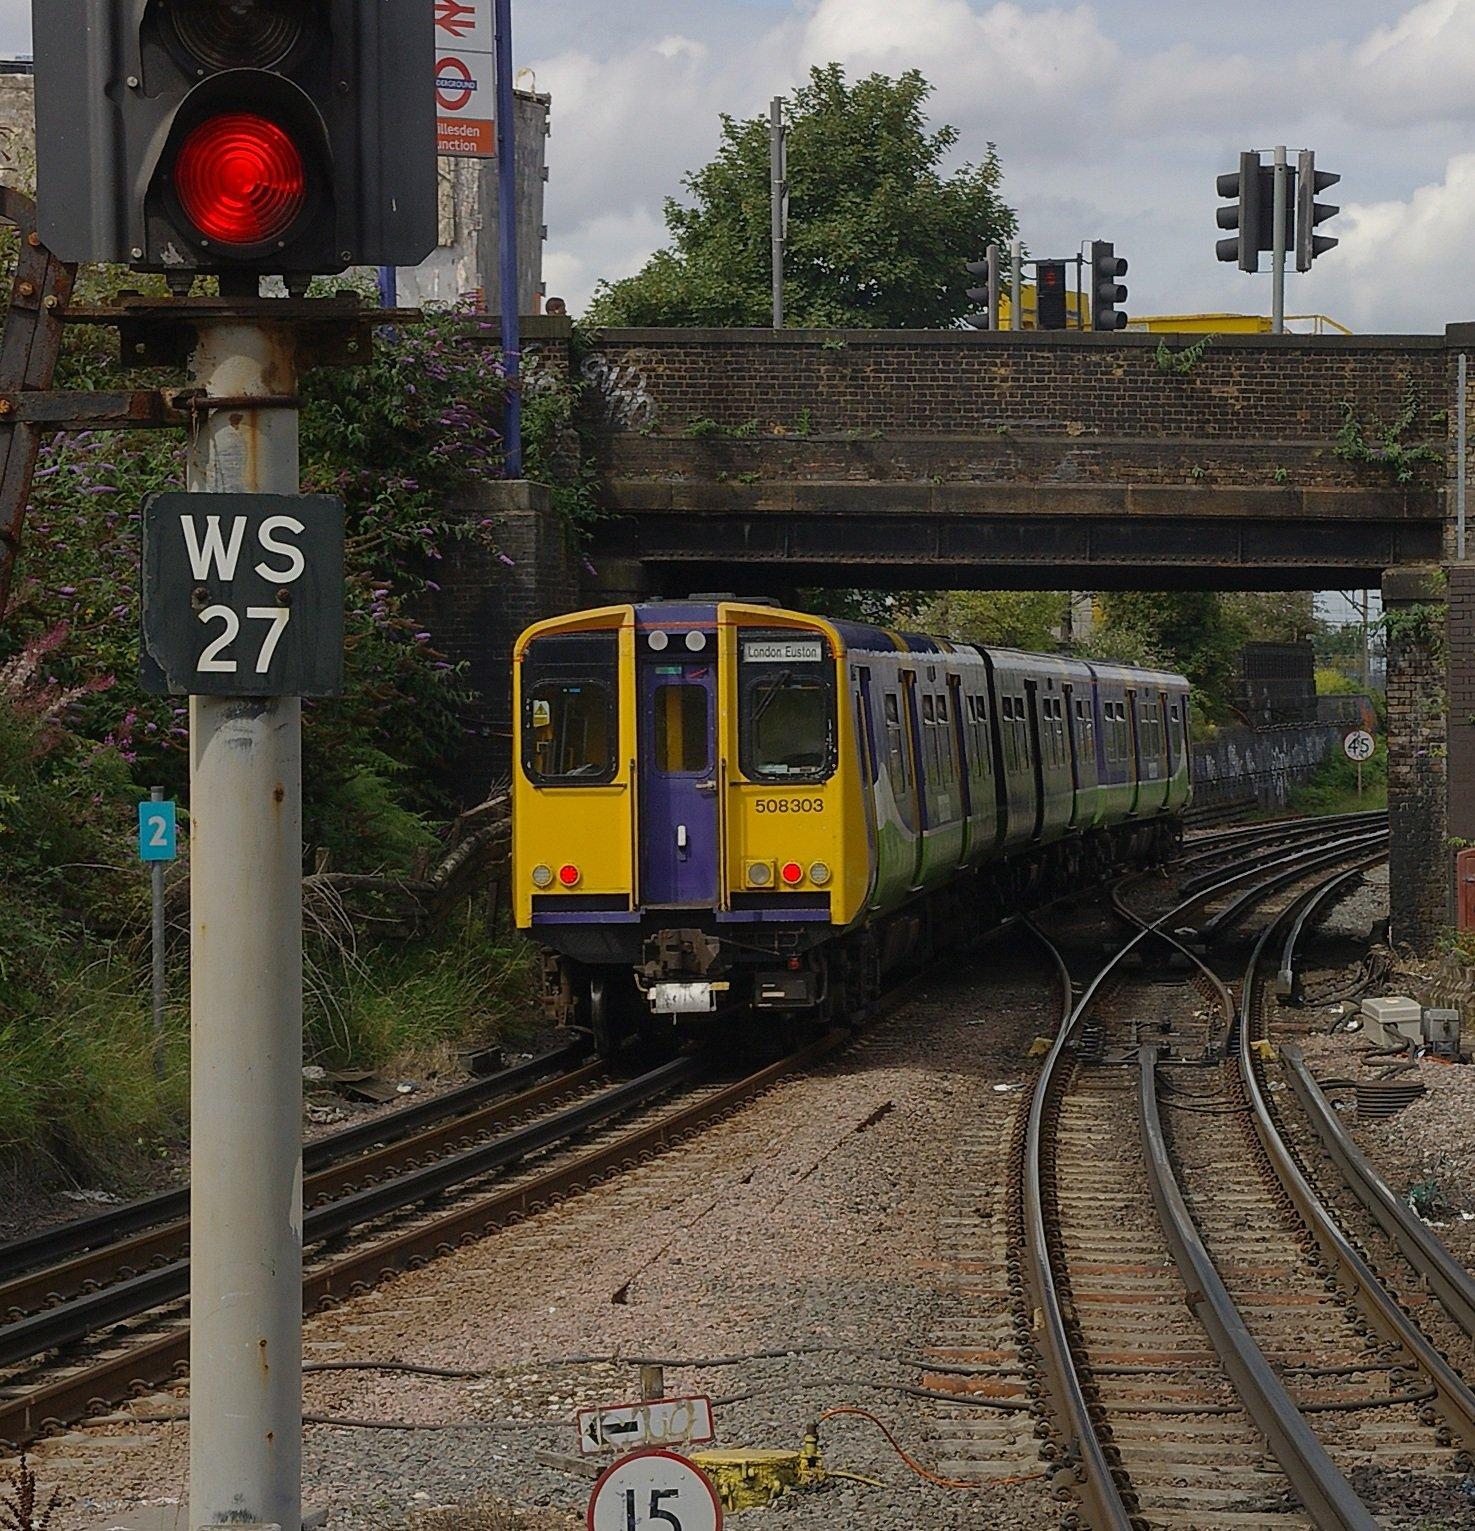 Willesden Junction station MMB 04 508303 The 20 Worst Tube Stations In London